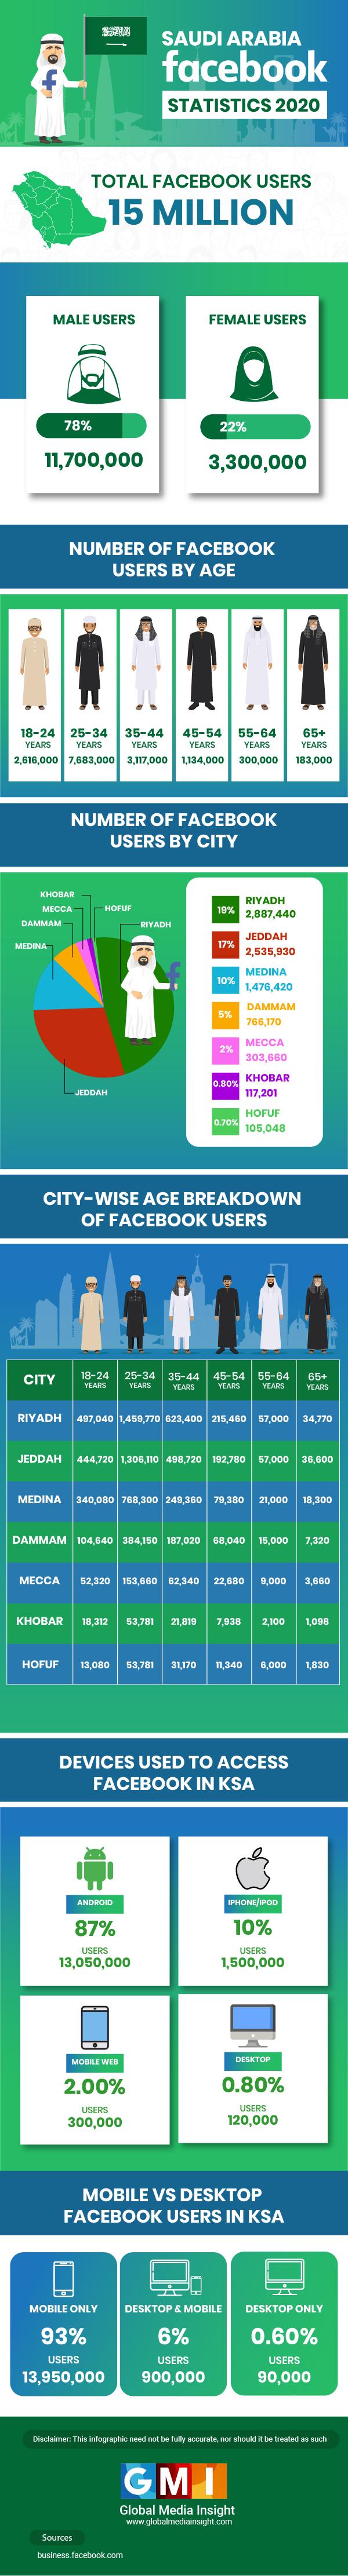 Saudi Arabia Facebook User Statistics 2020 #infographic